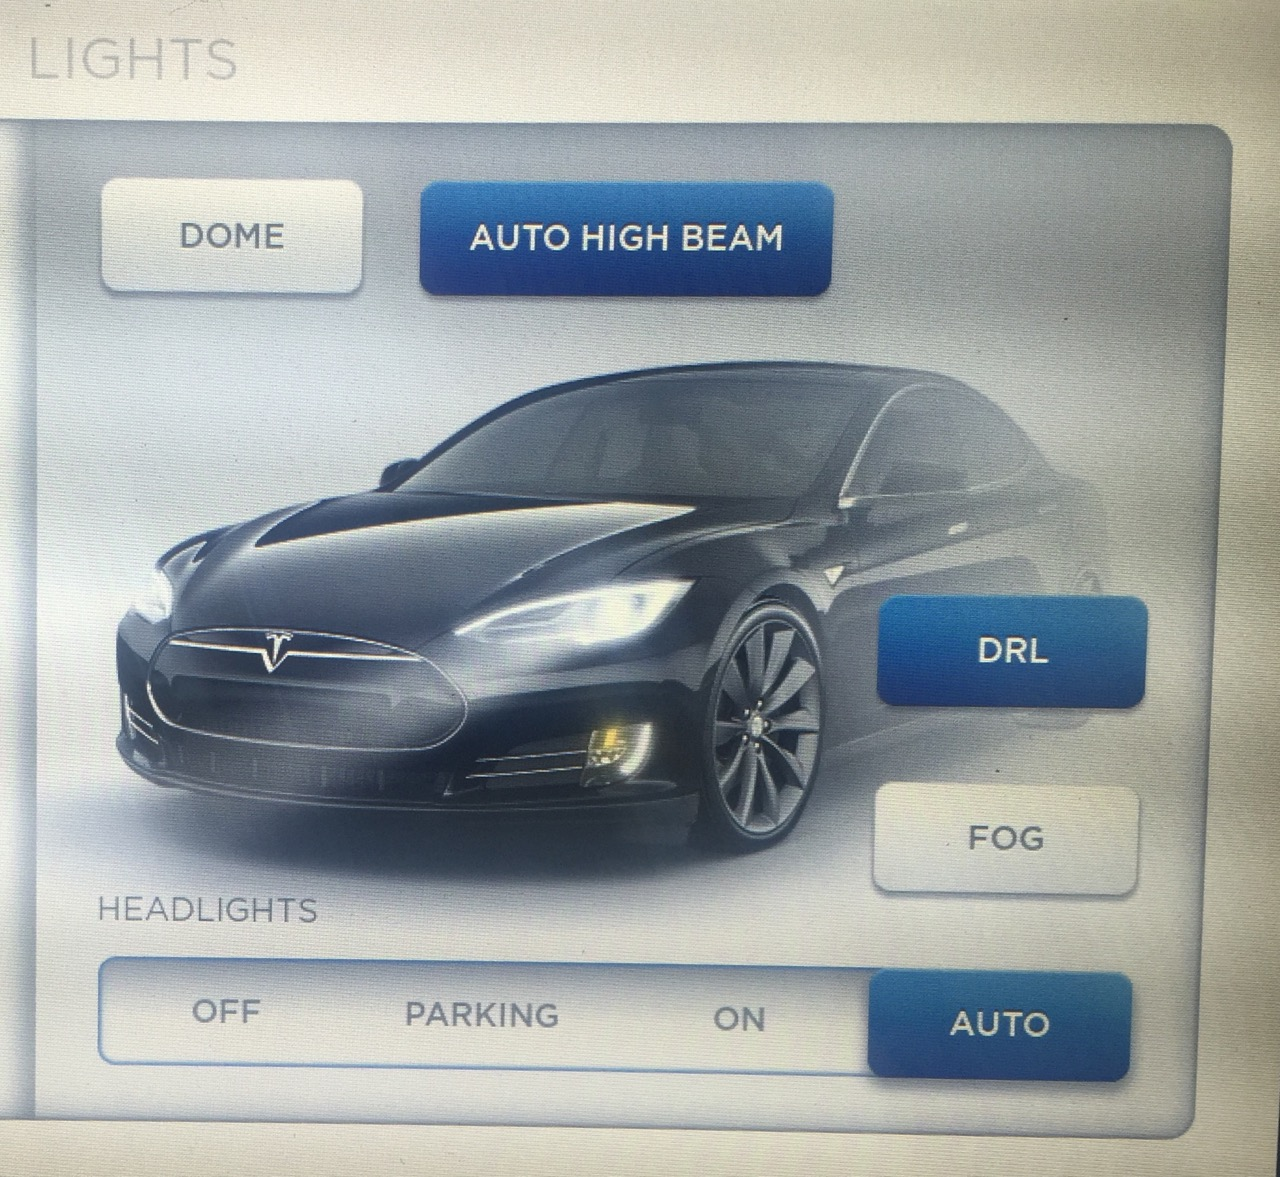 Auto High Beam Controls